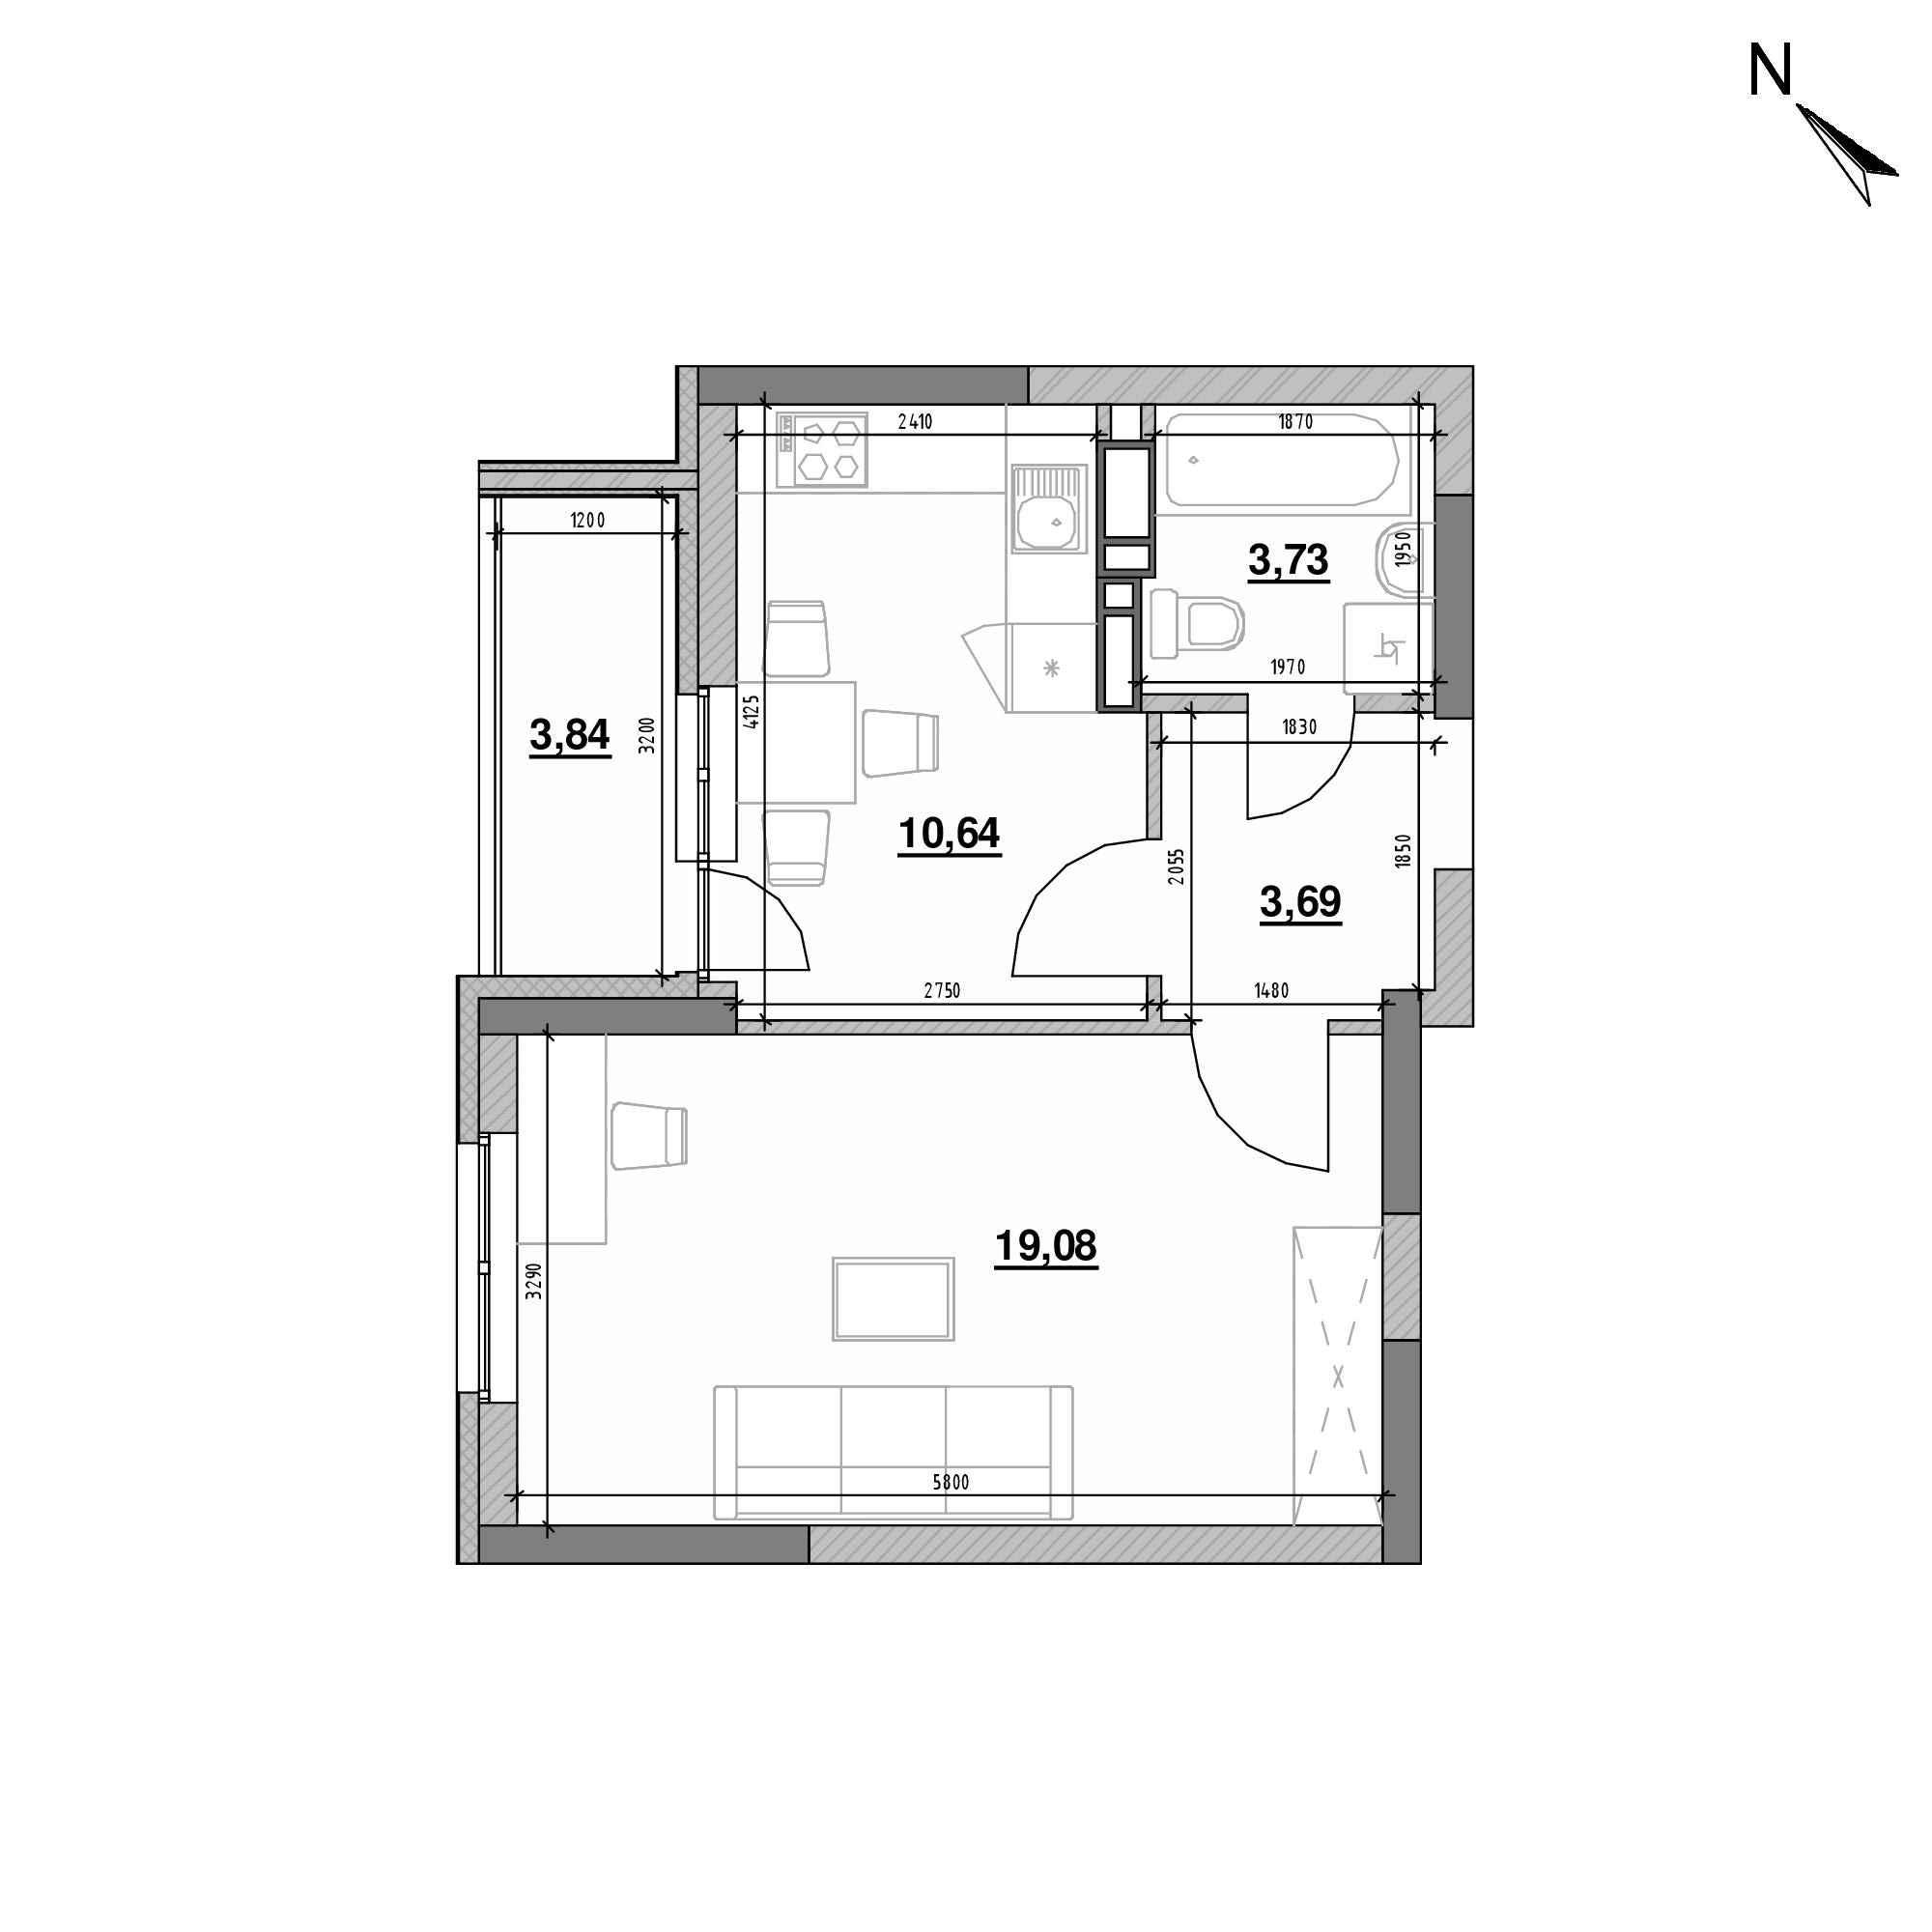 ЖК Оk'Land: планування 1-кімнатної квартири, №206, 40.98 м<sup>2</sup>